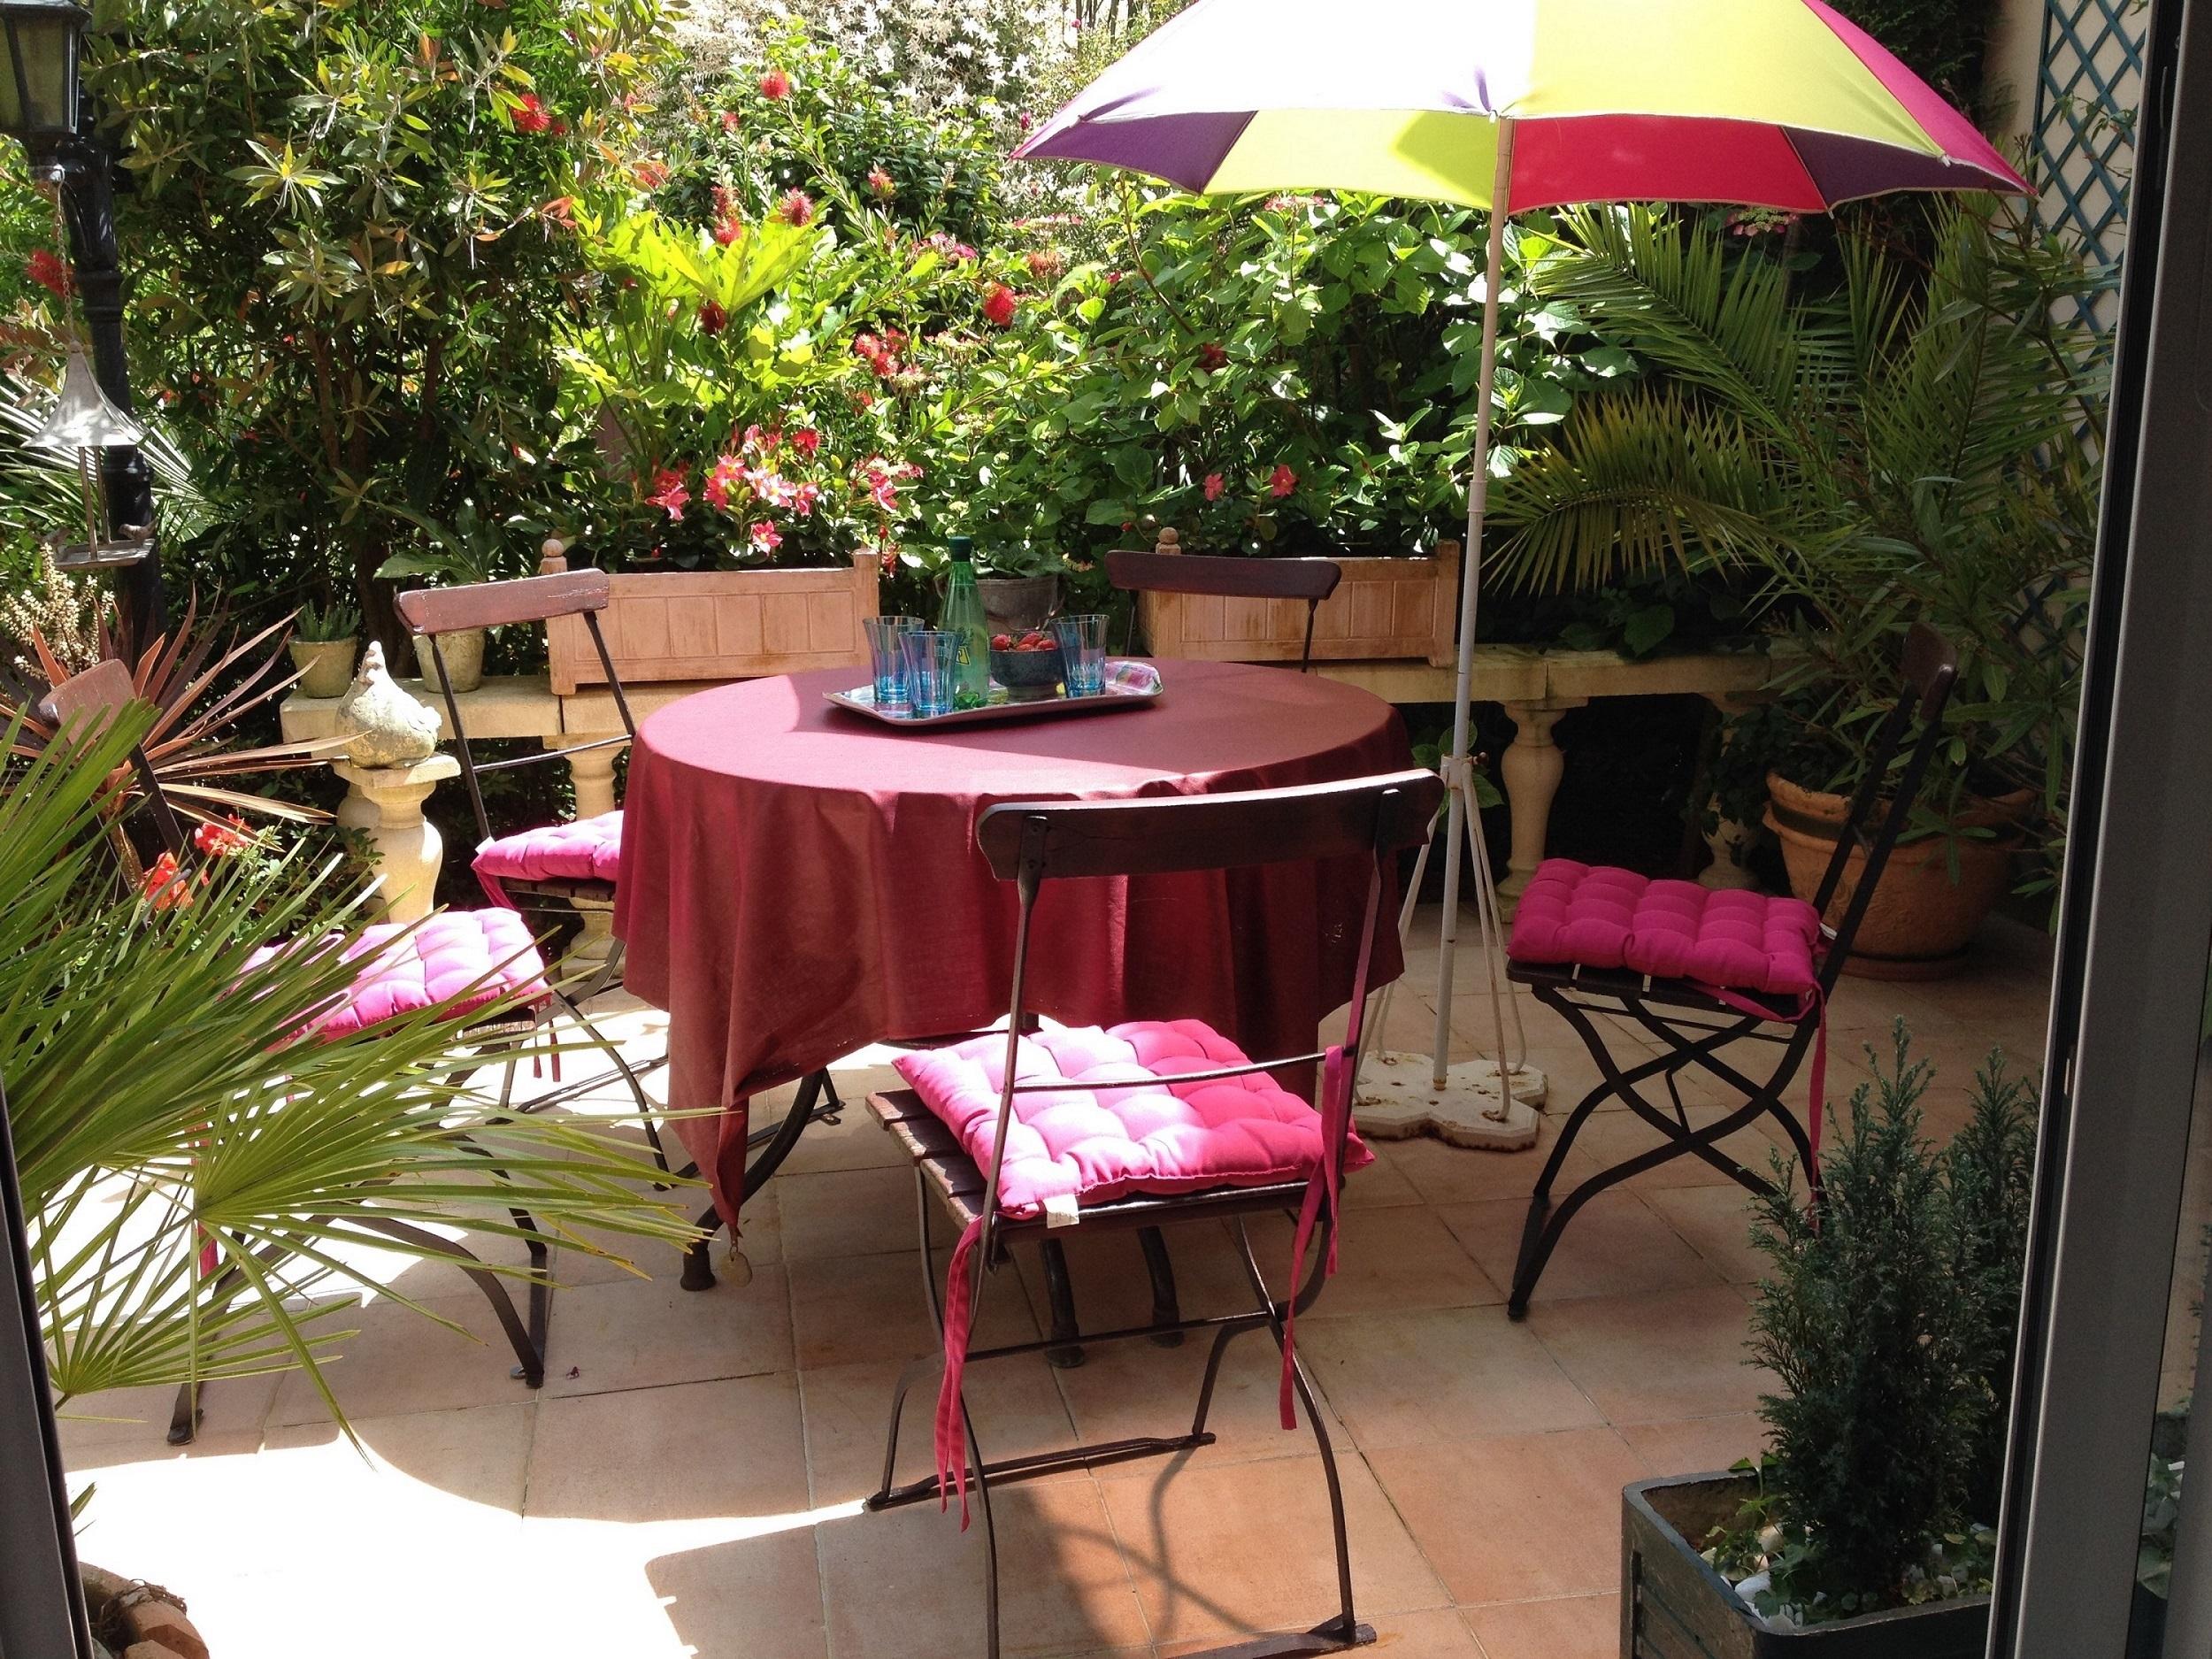 location vacances Morbihan ; chambre hote Bretagne sud ; Groix, Larmor-Plage